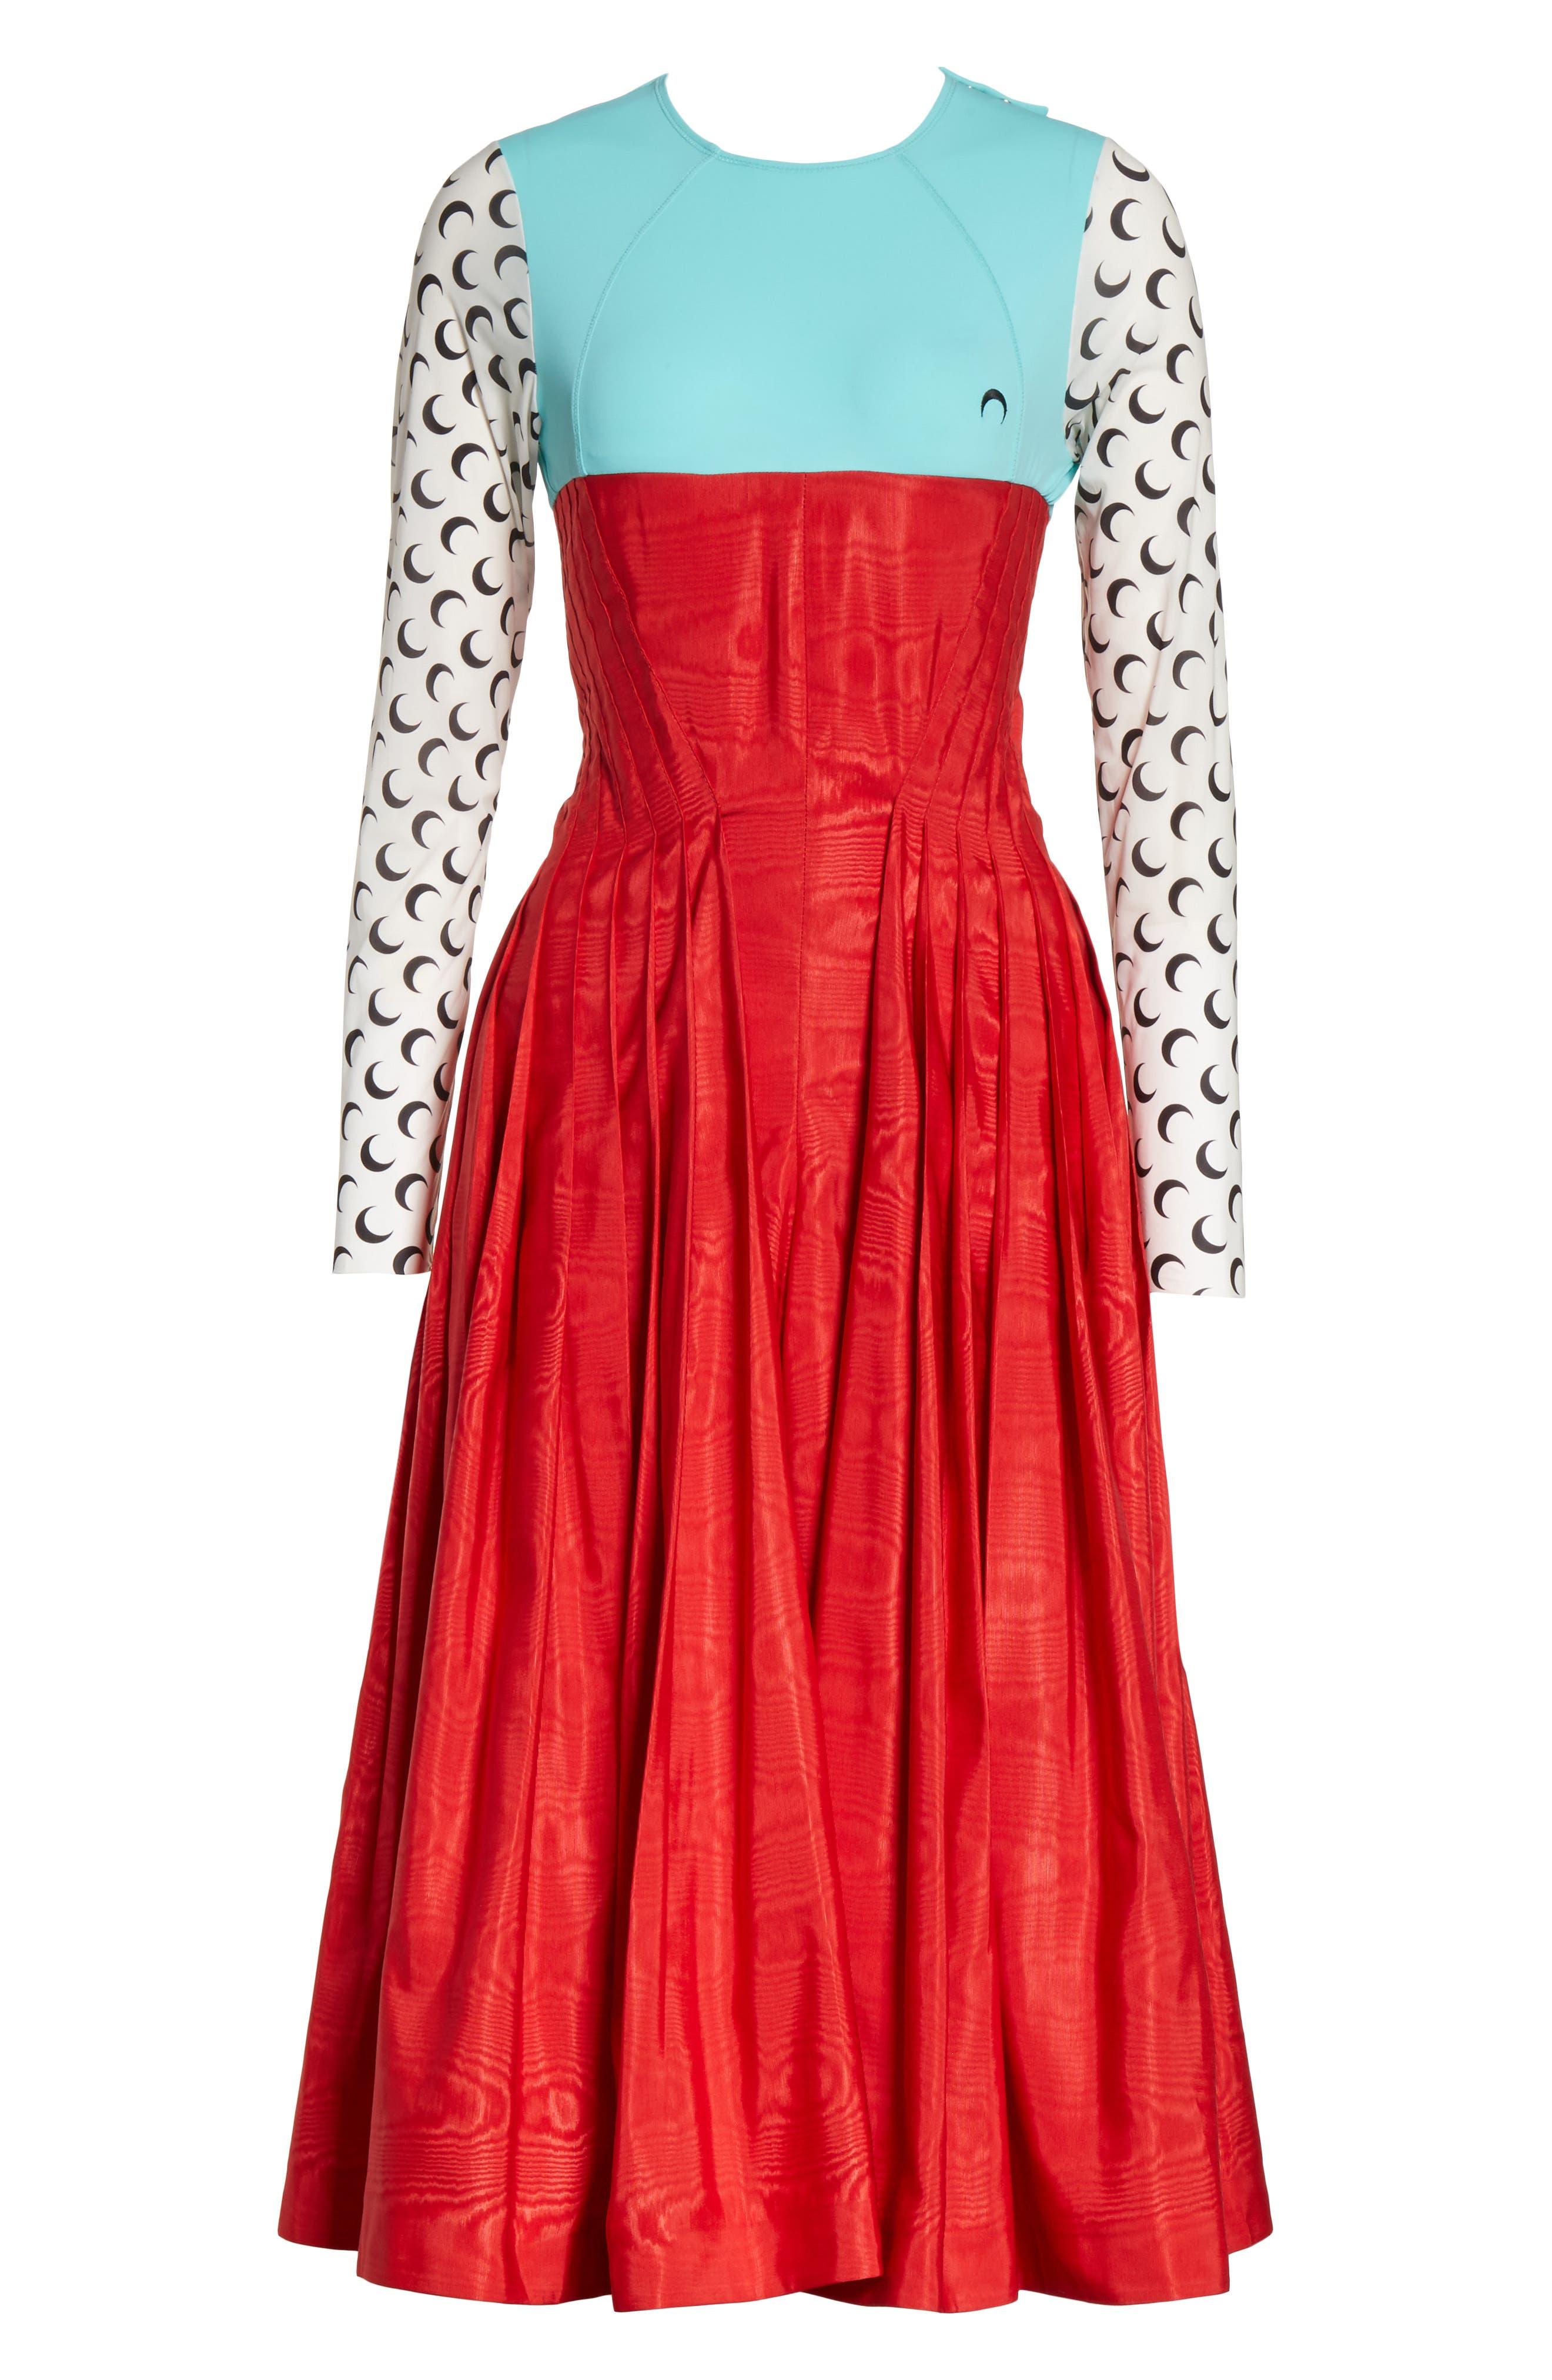 Hybrid Moiré Dress,                             Alternate thumbnail 7, color,                             Turquoise/ Red